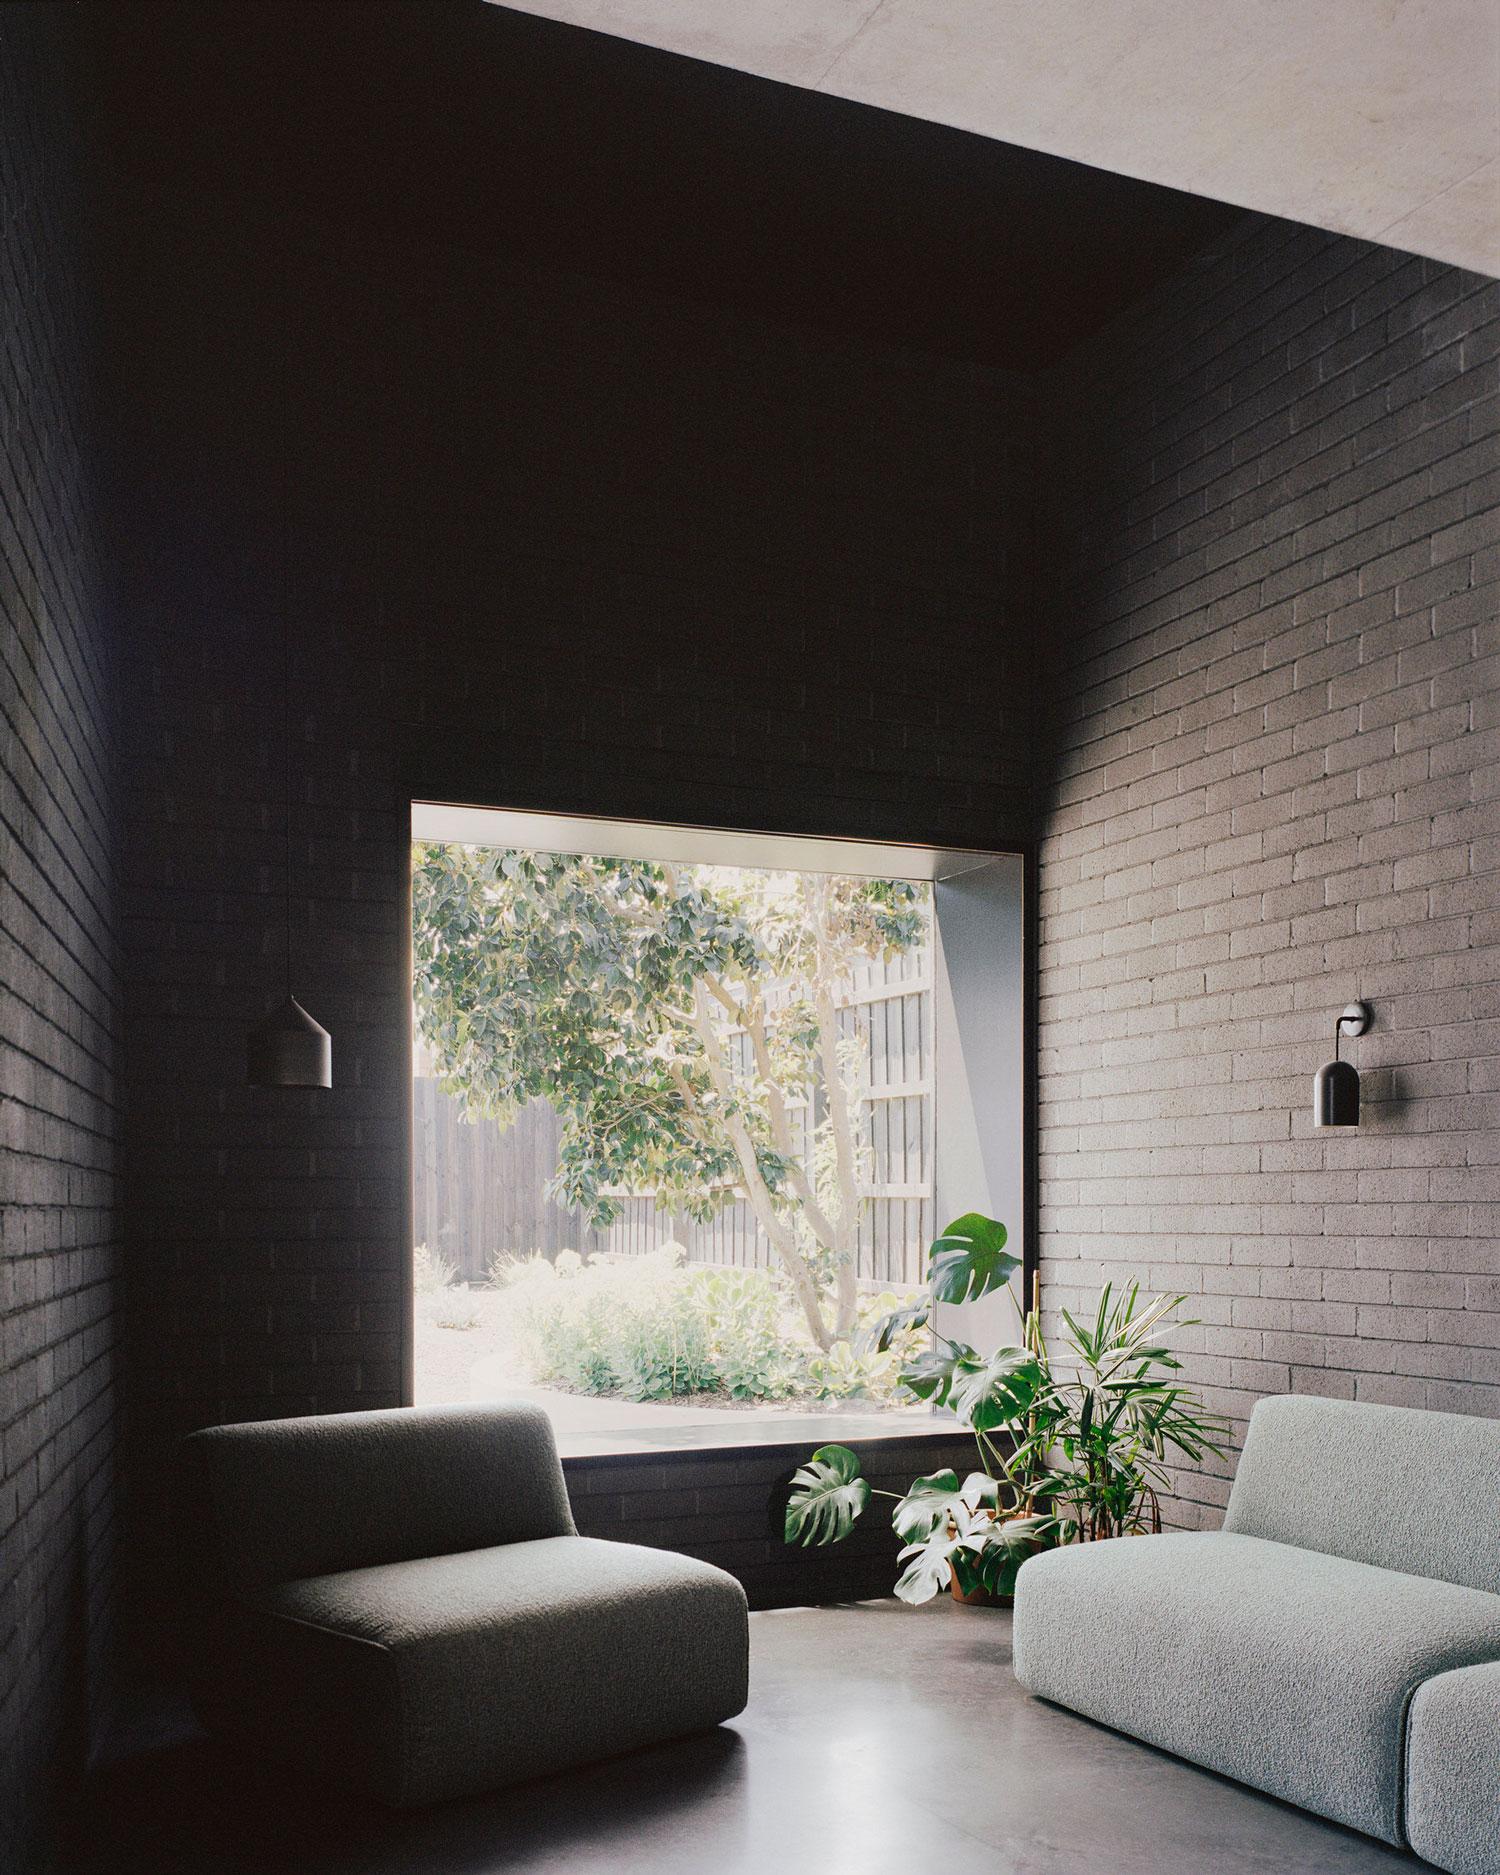 Clinker Brick House Melbourne, Studio Bright, Australian Architecture, Photo Rory Gardiner | Yellowtrace